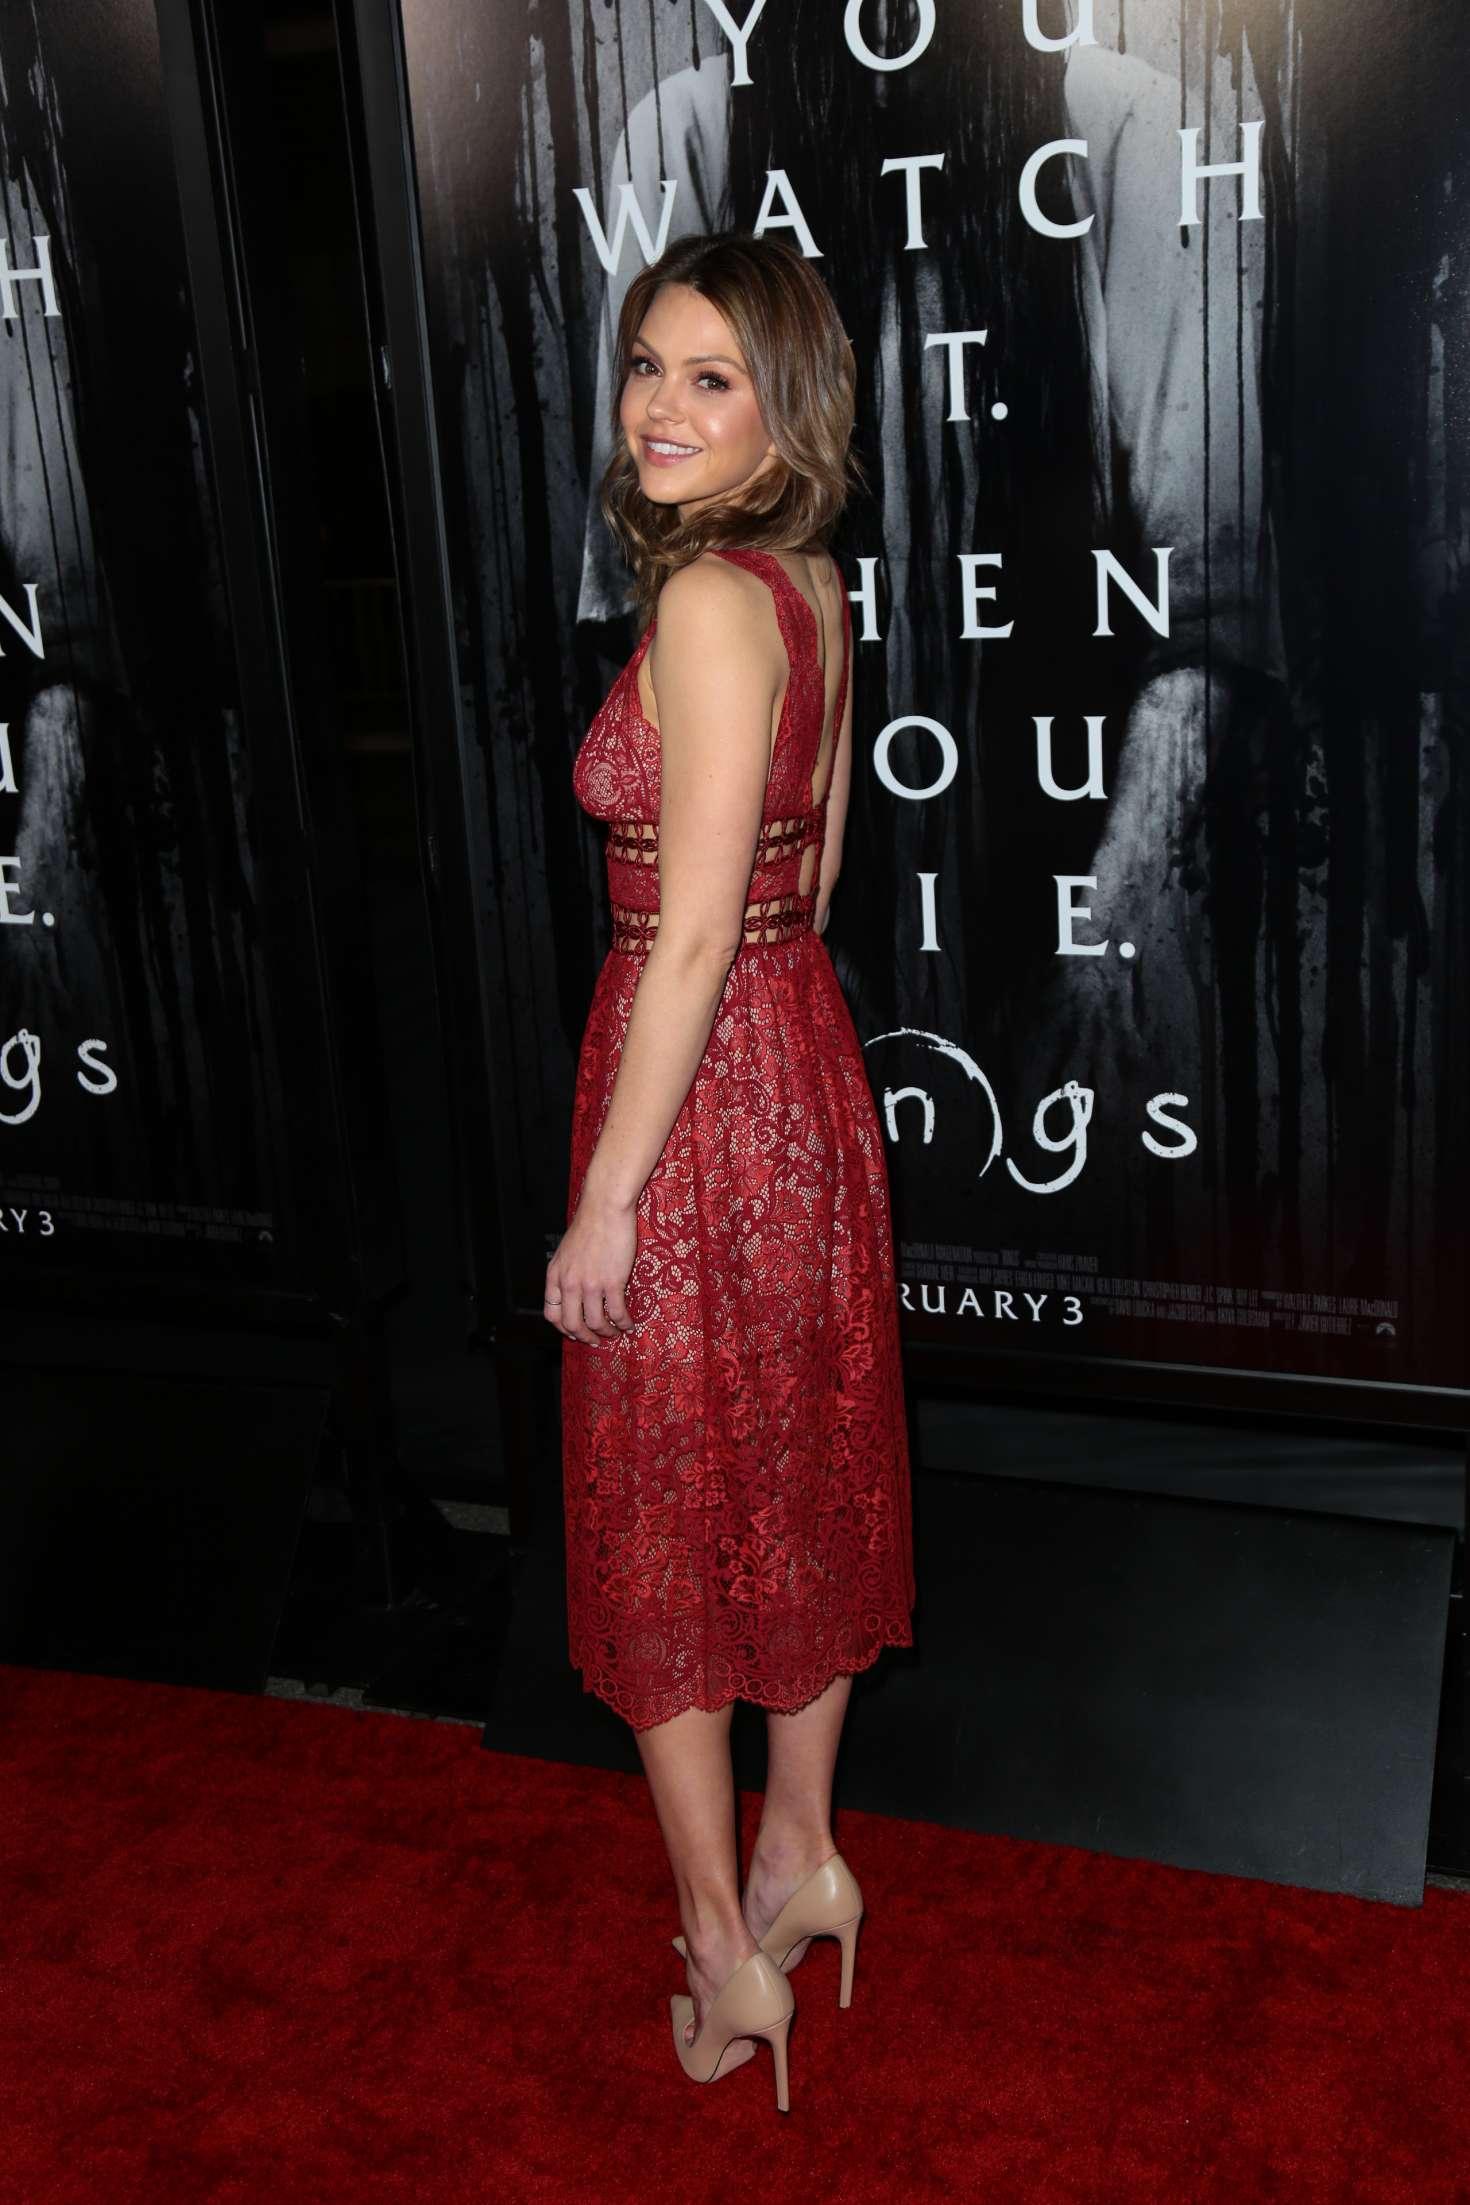 Aimee Teegarden 2017 : Aimee Teegarden: Rings LA Premiere -40